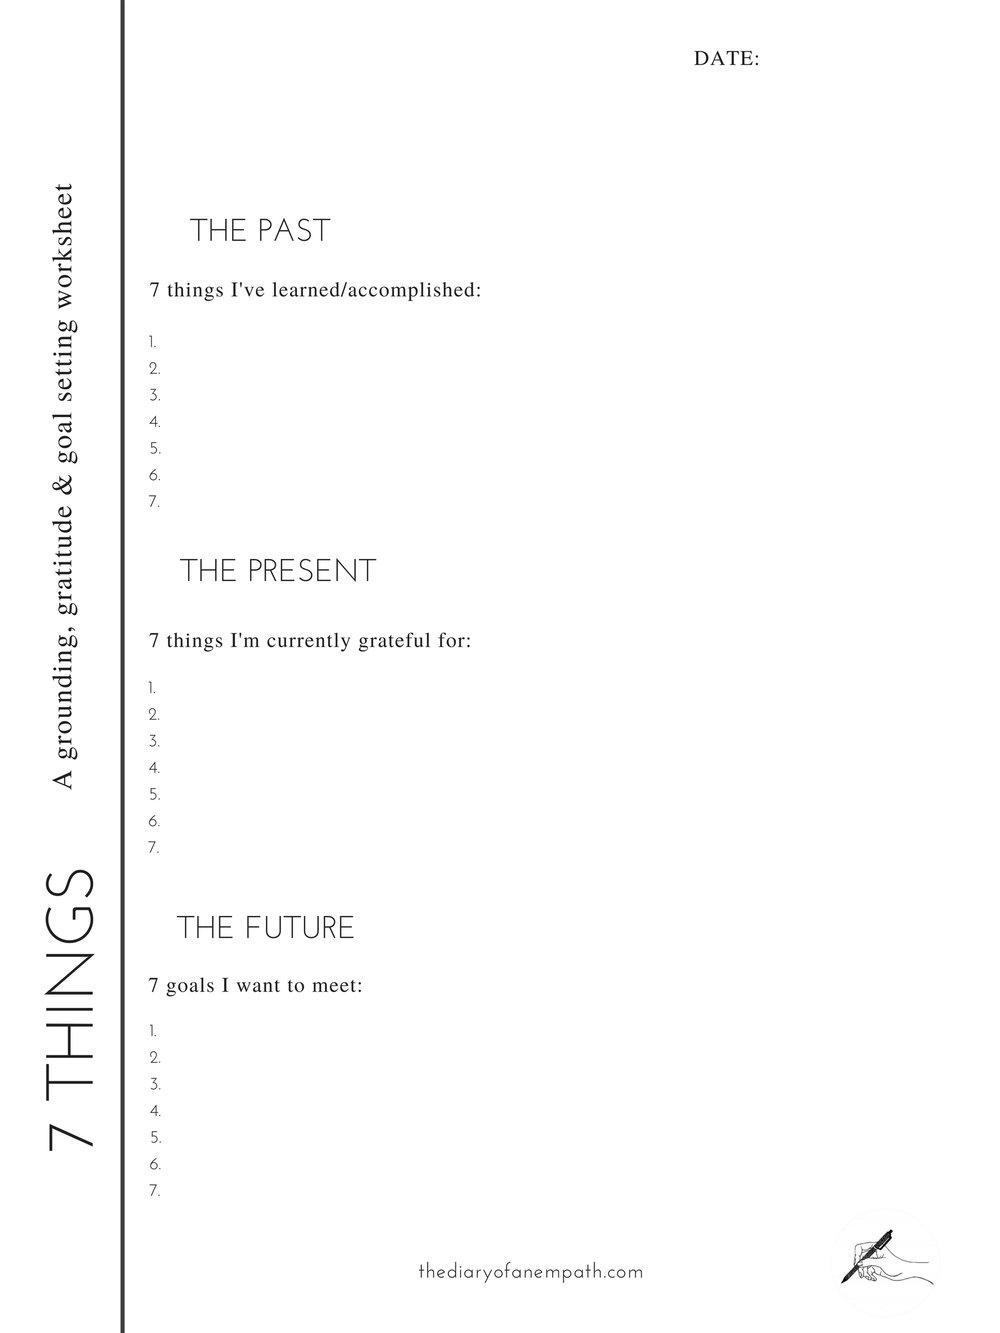 goal-setting-work-sheet